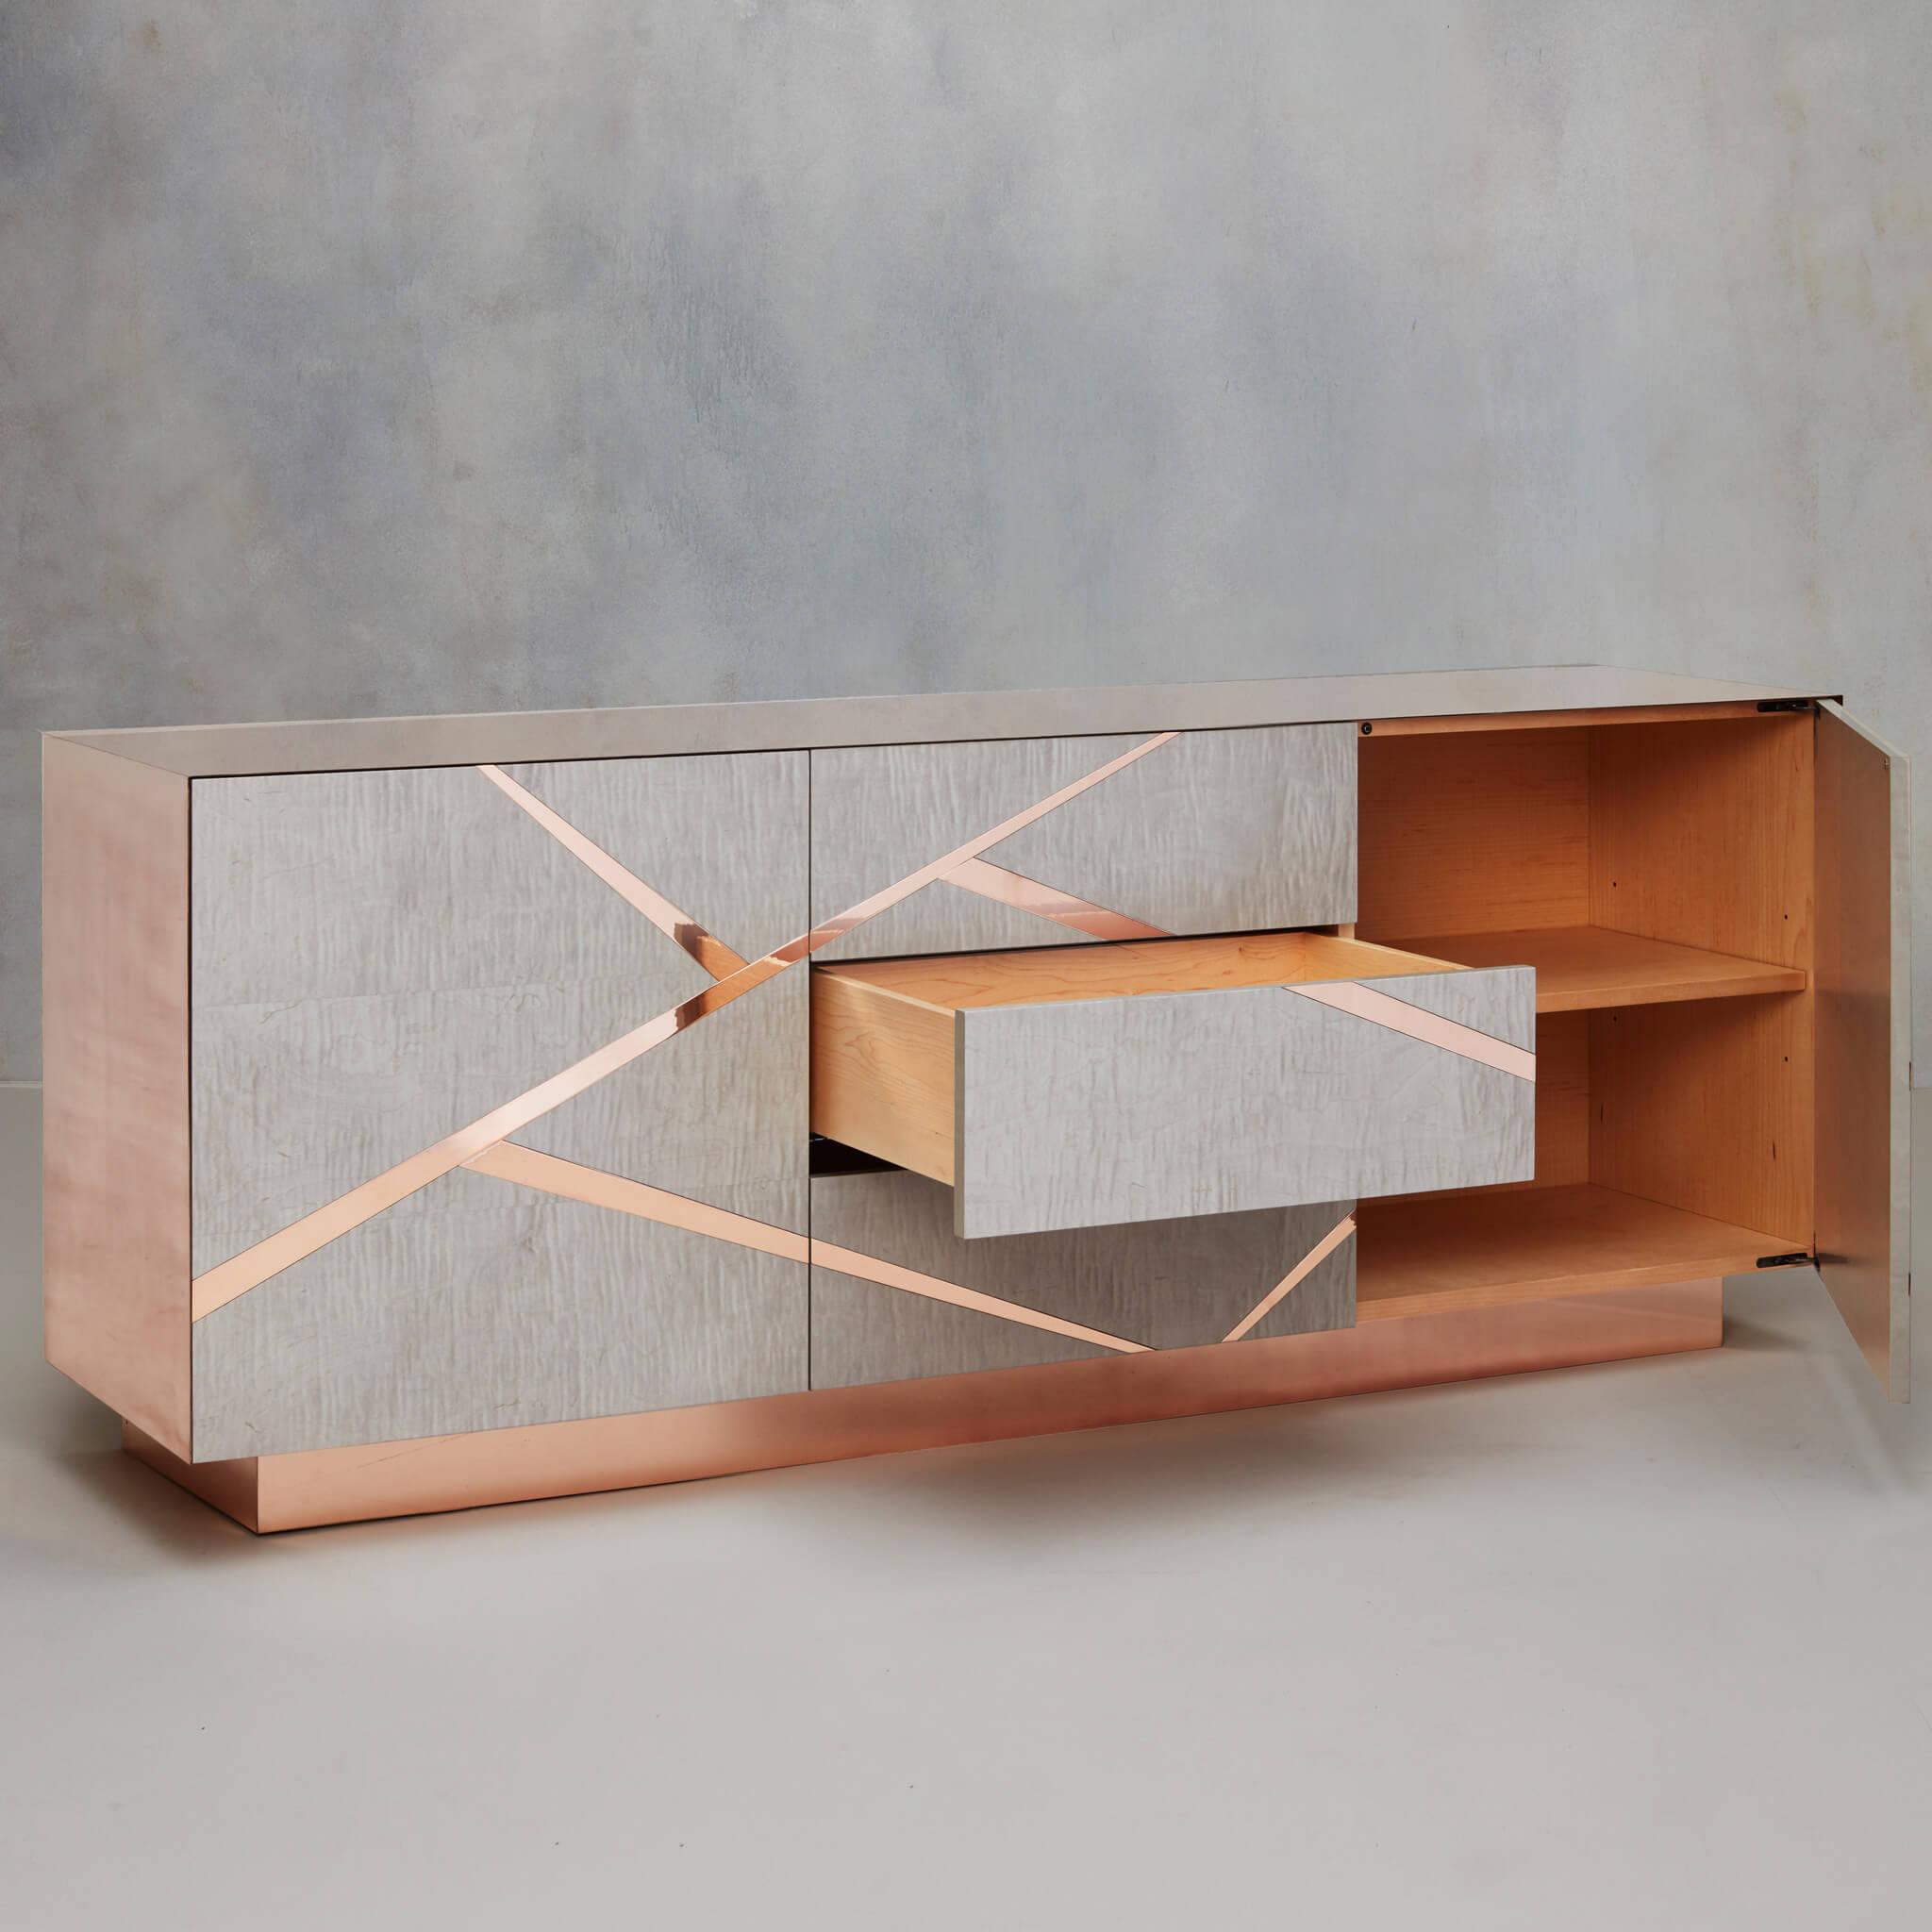 Odessa cabinet by Tom Faulkner